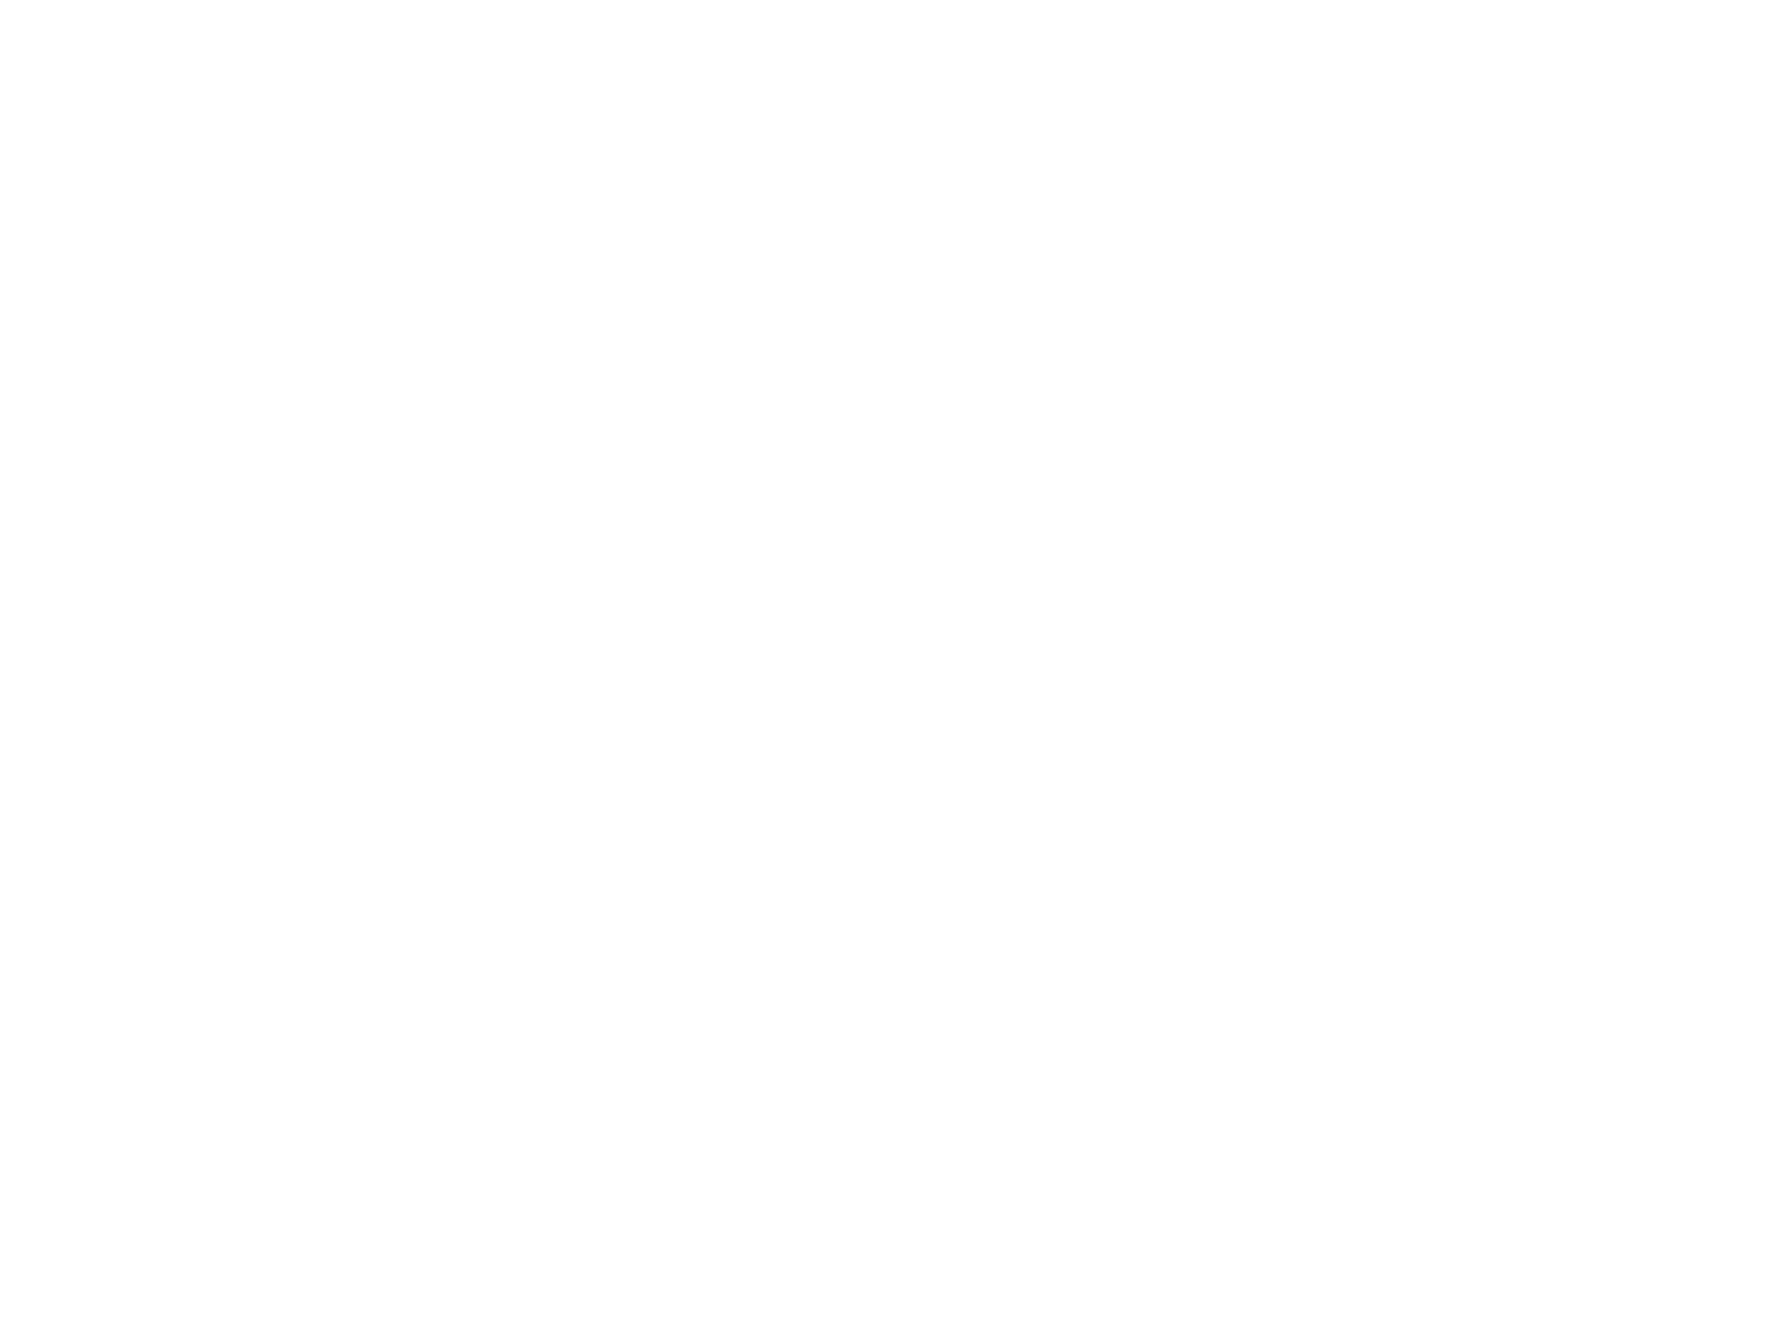 Parlay logo white.png